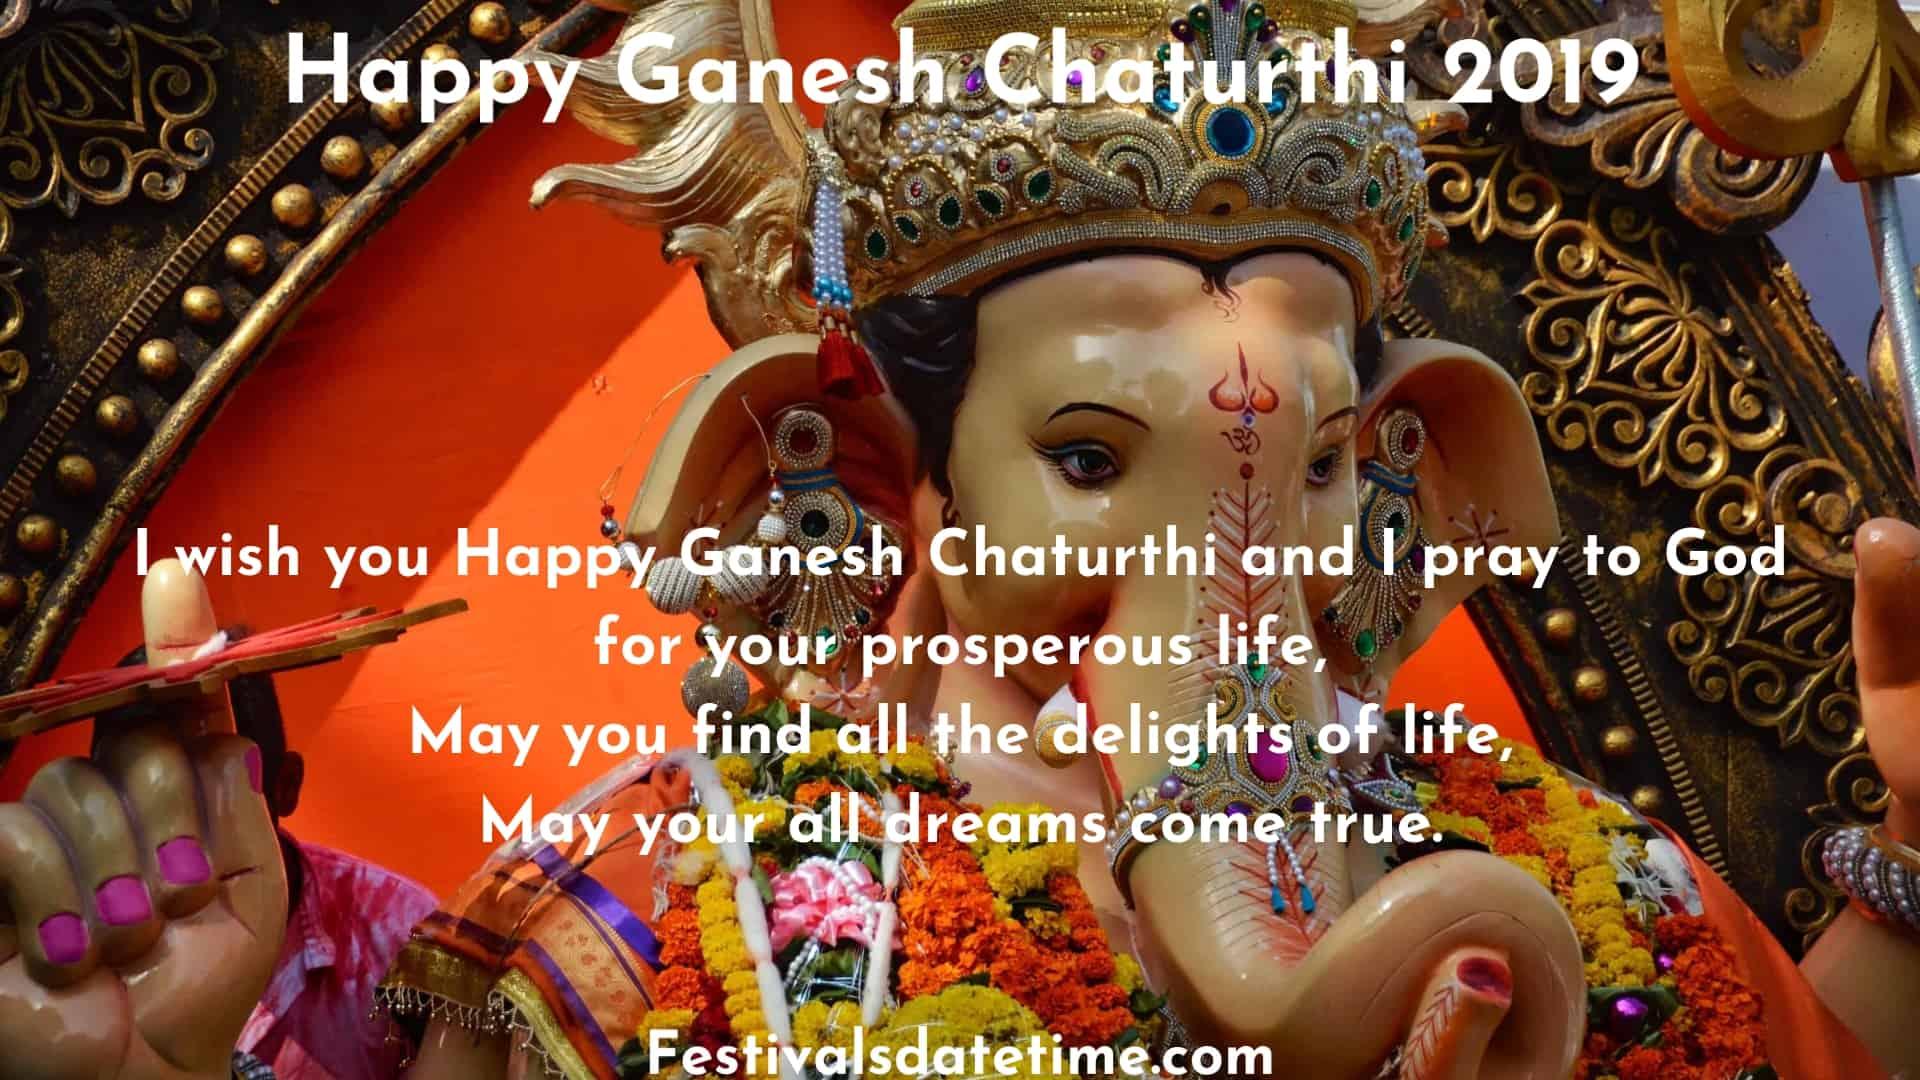 ganesh_chaturthi_images_in_2019